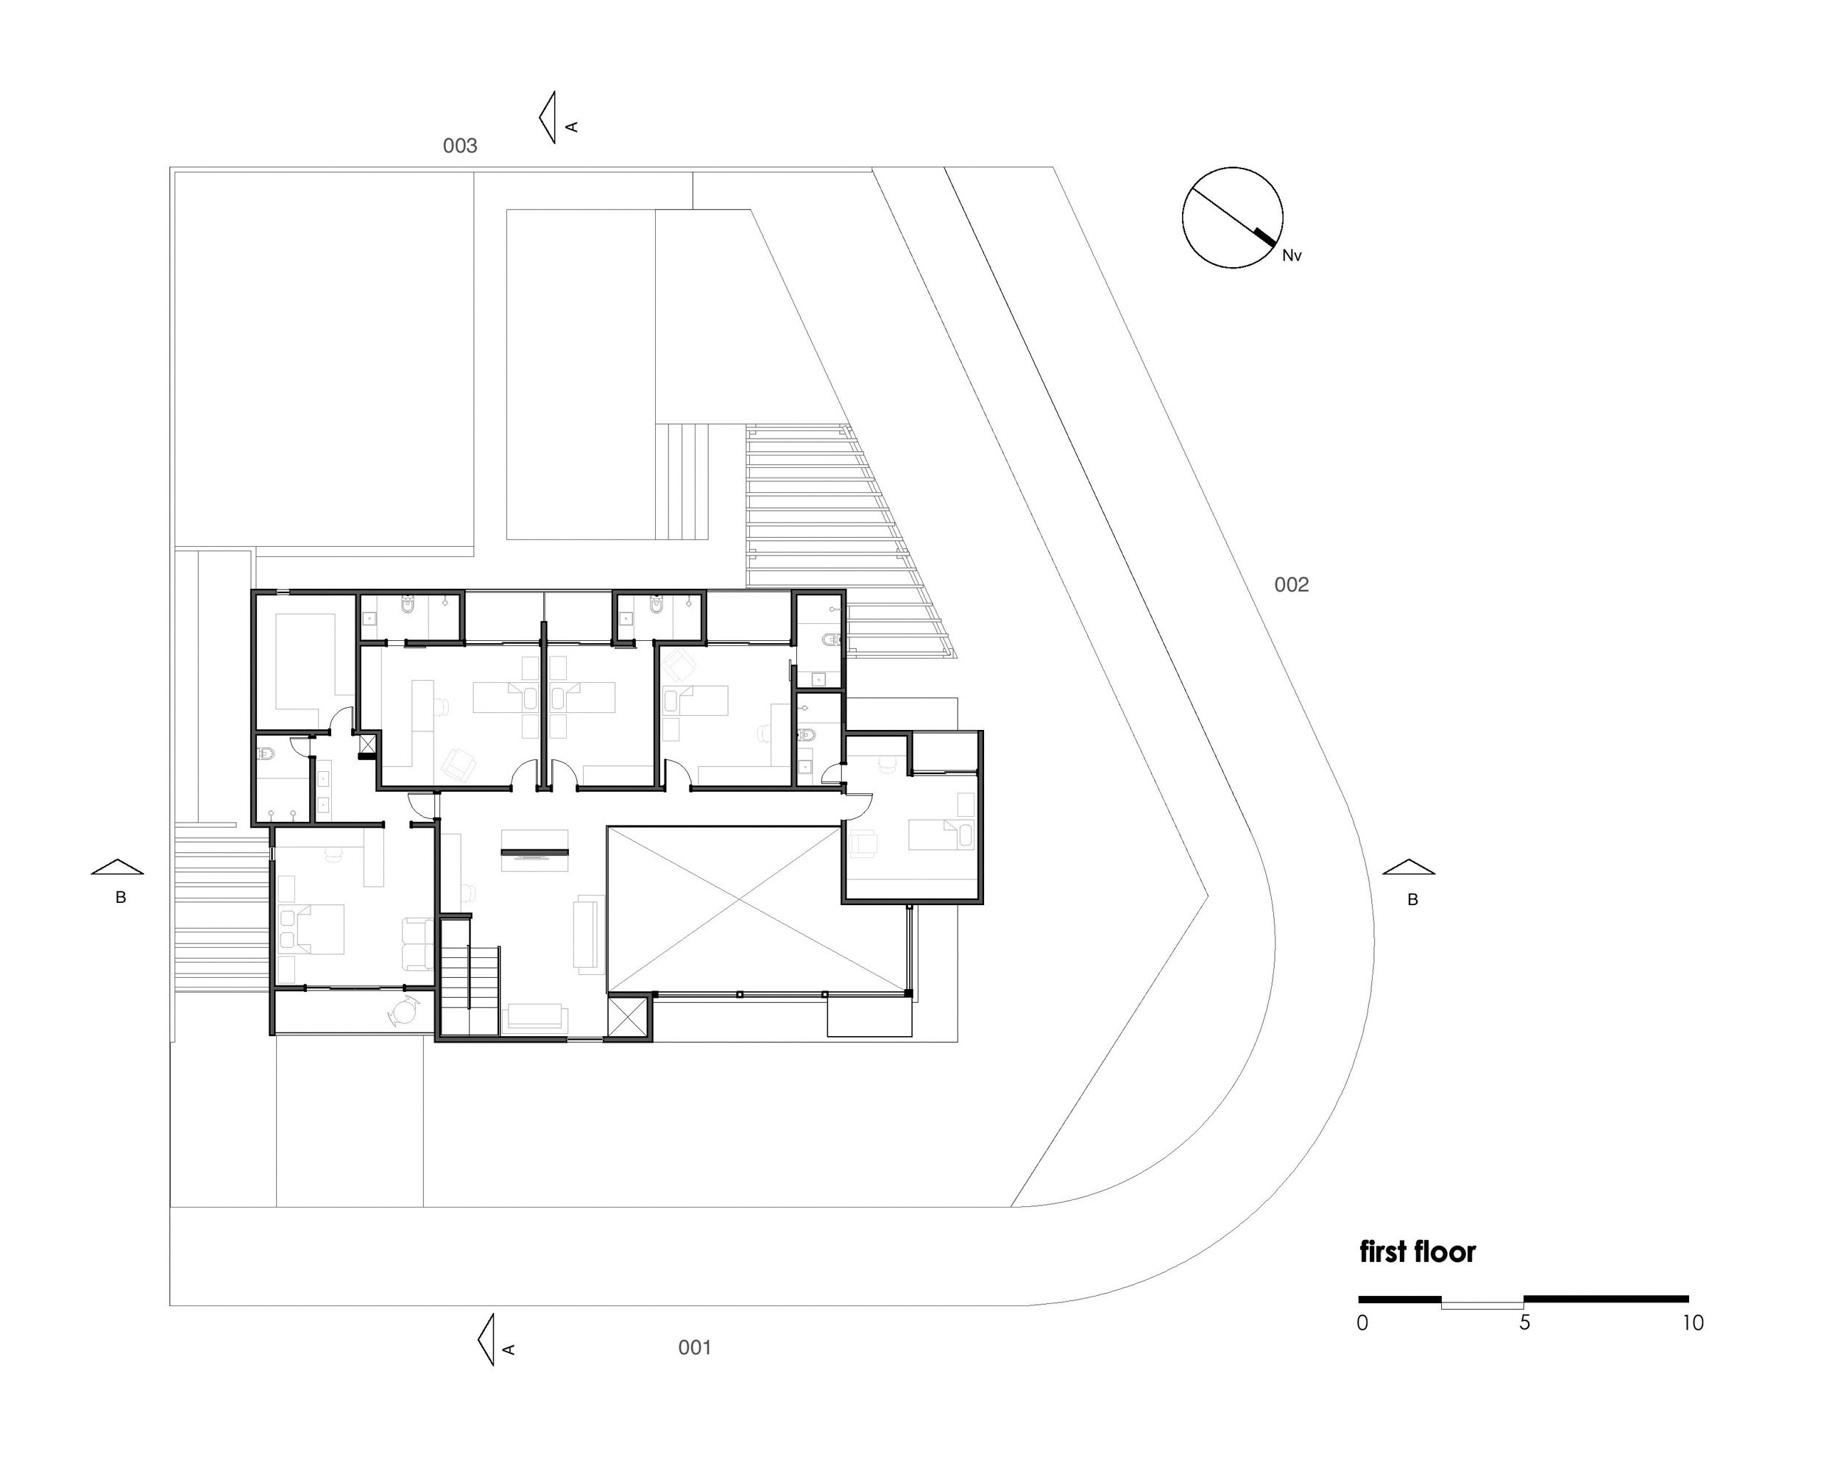 First Floor Plan – Atenas 038 House – Goiânia, Goiás, Brazil